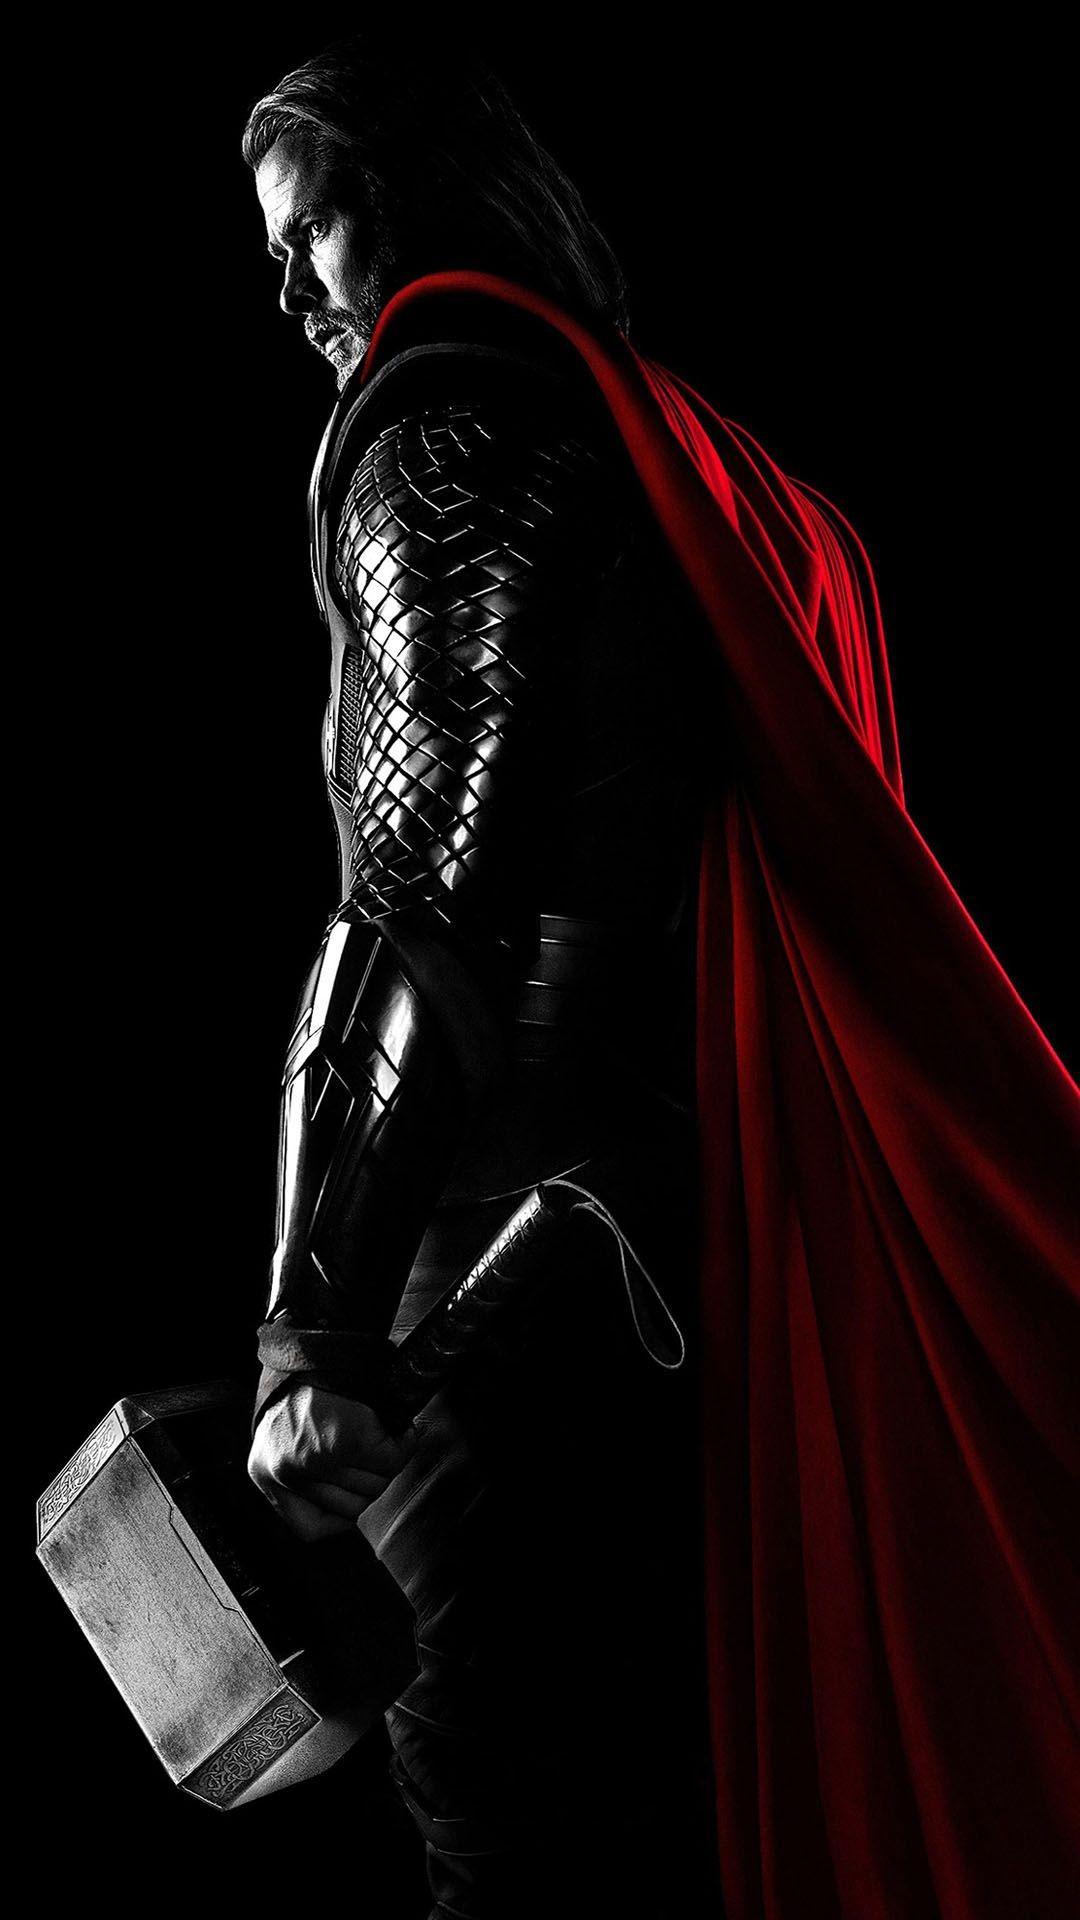 Thor Wallpaper Hd 1080×1920. Download